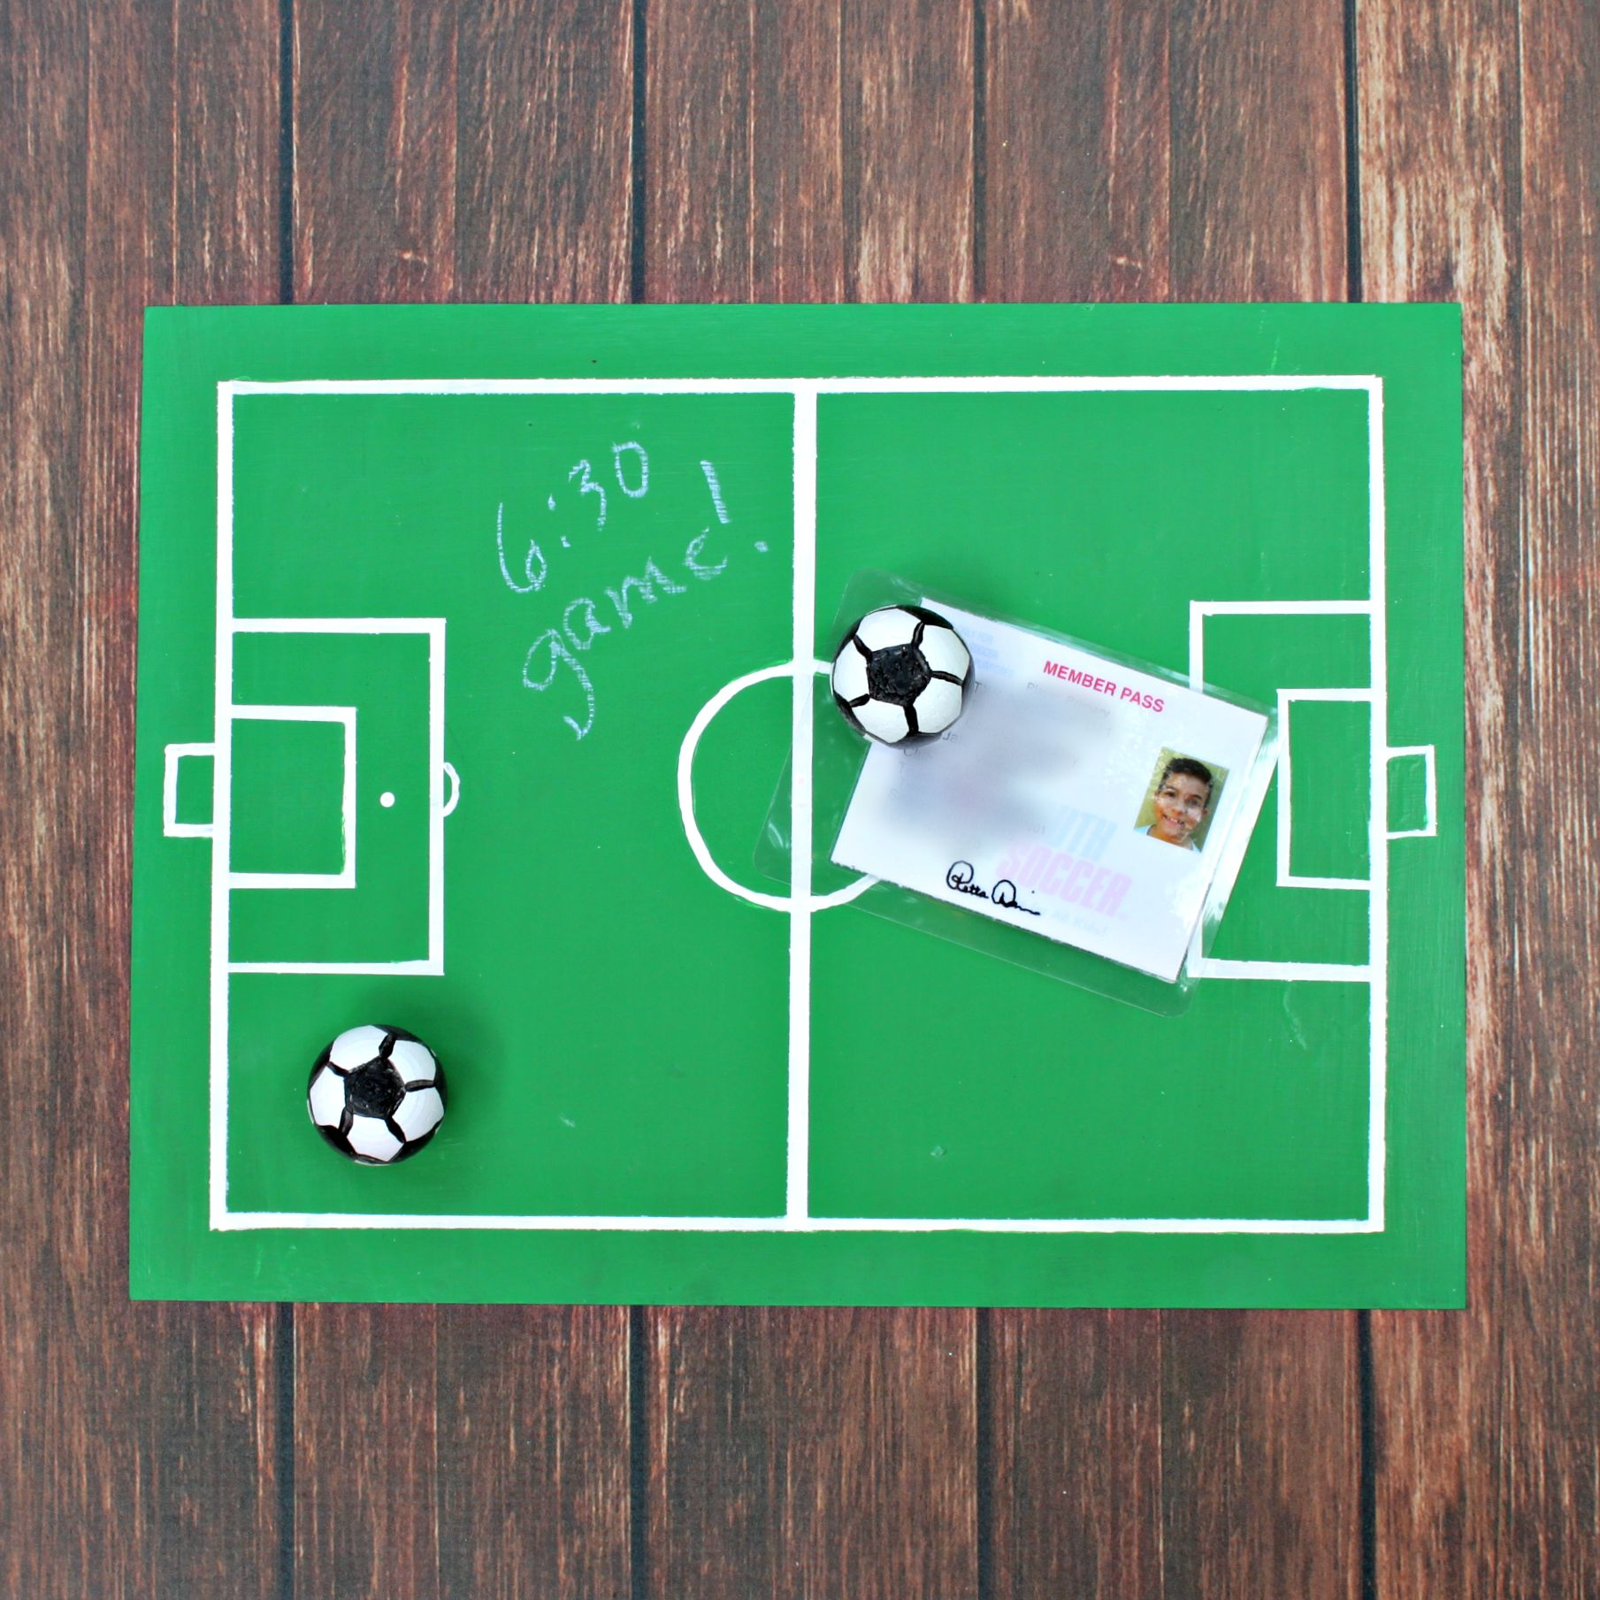 soccer board game ideas - Soccer Valentine Box